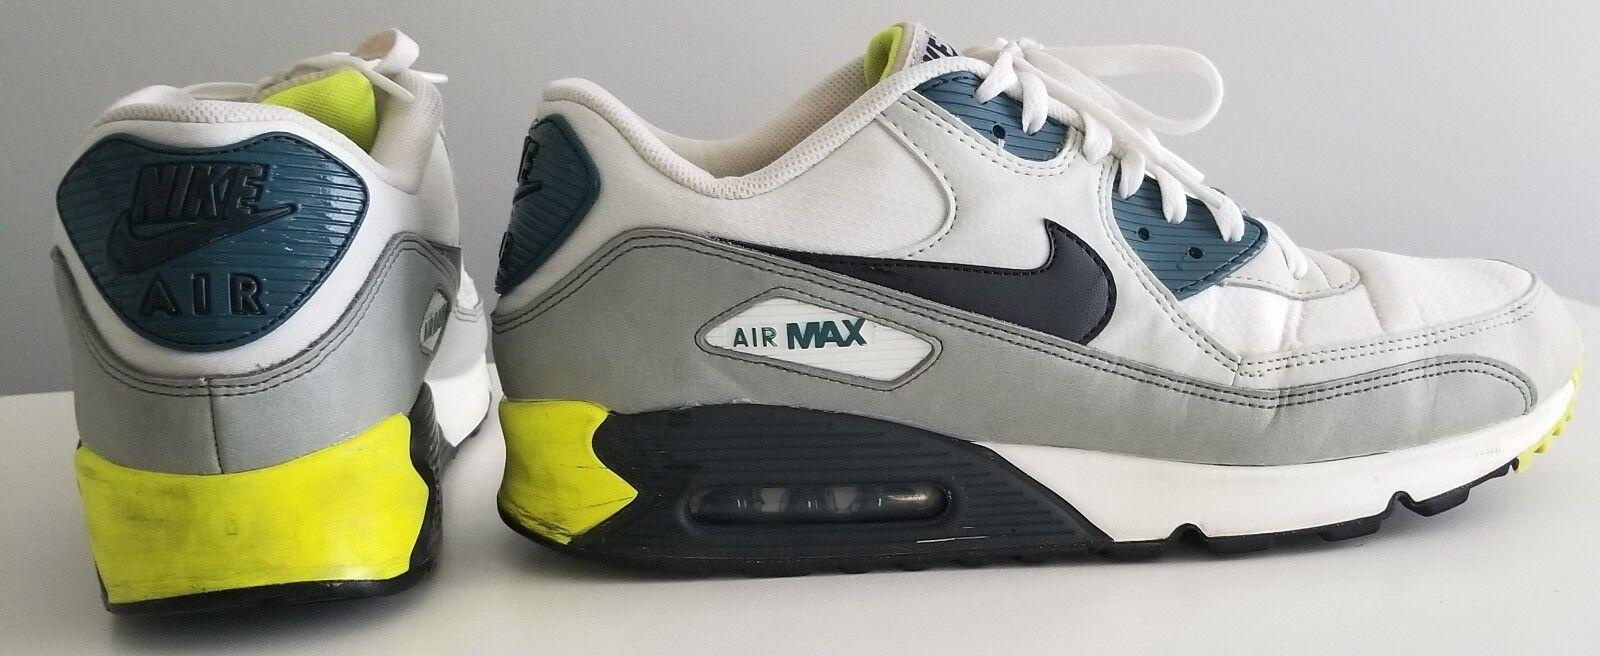 Nike Air Max salvaje 90 talla 13 casual salvaje Max 7c2510